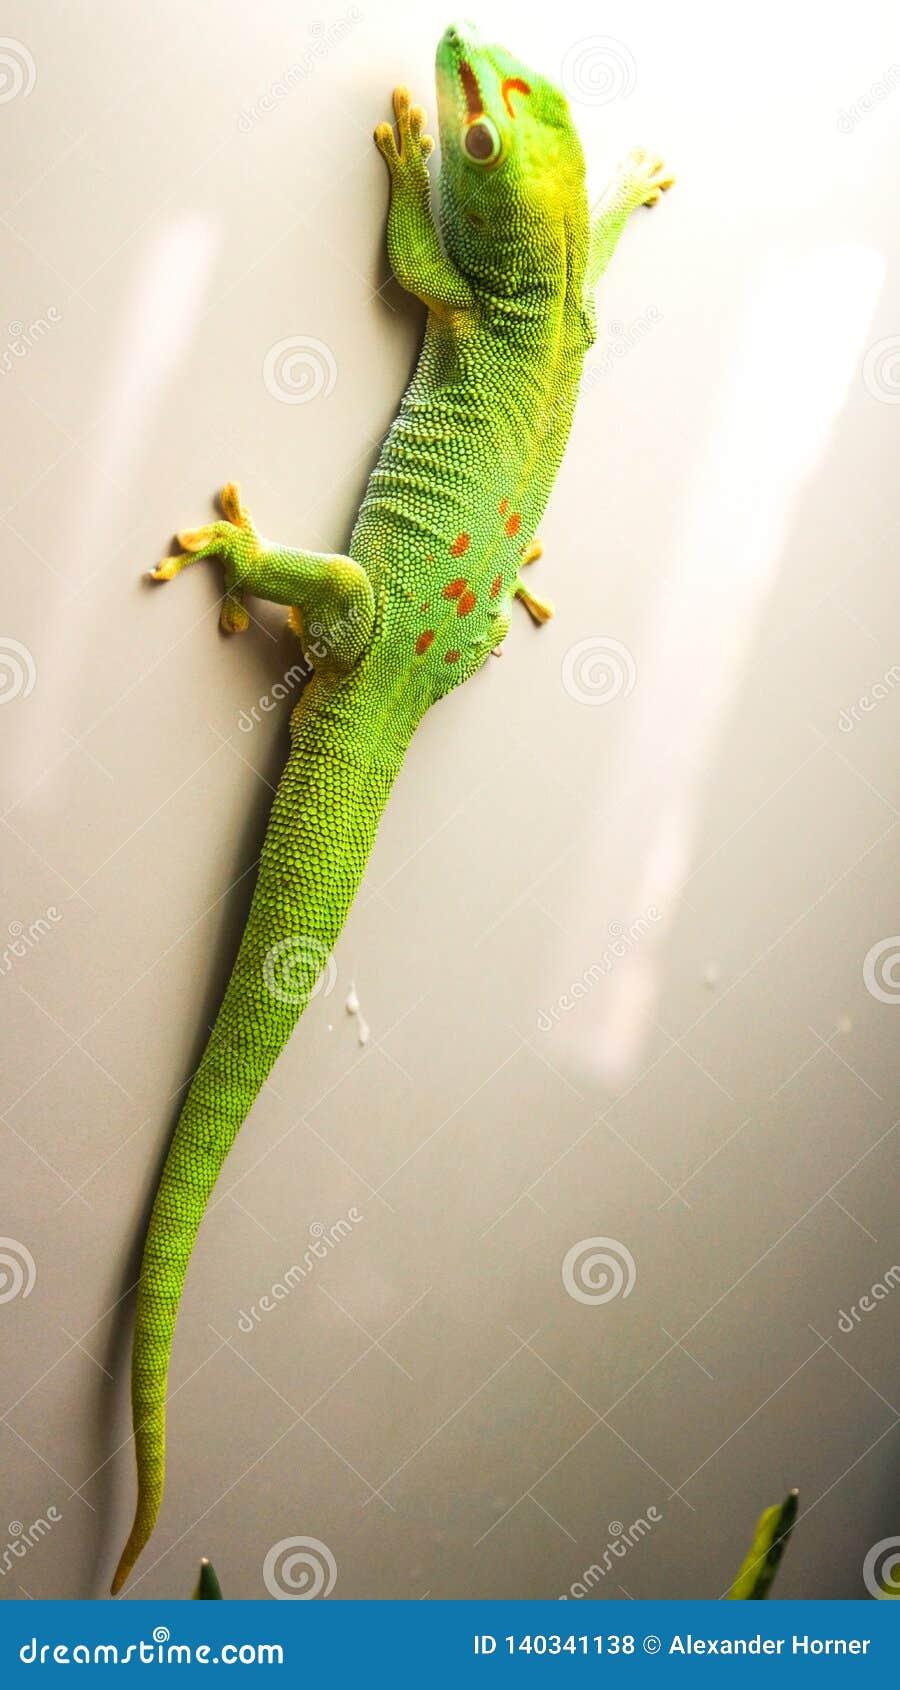 Caroline anole lizard green colorful climbing up wall